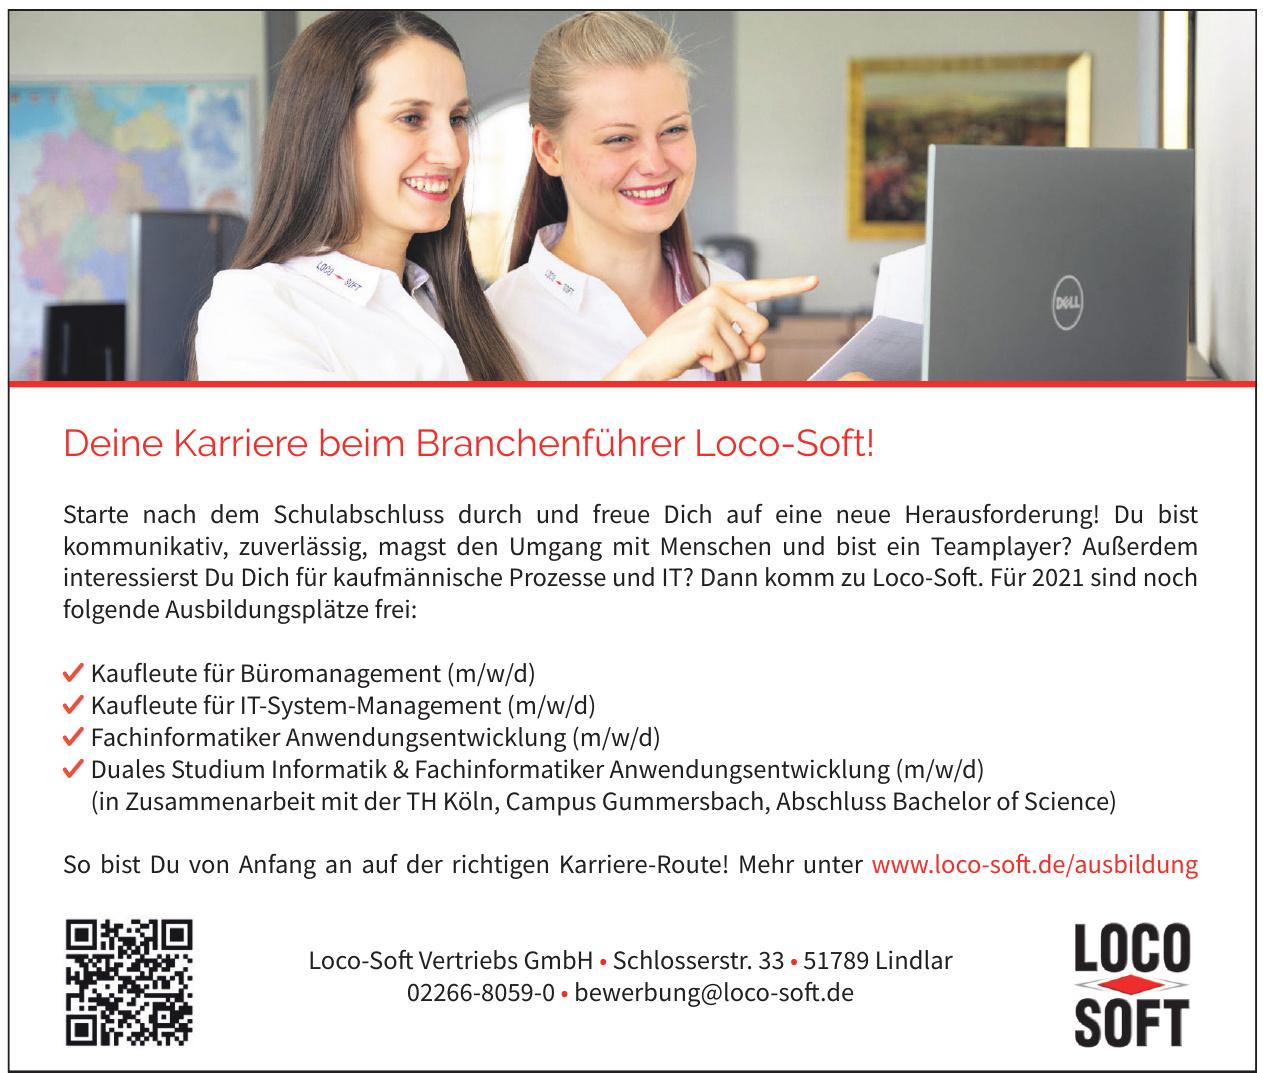 Loco-Soft Vertriebs GmbH